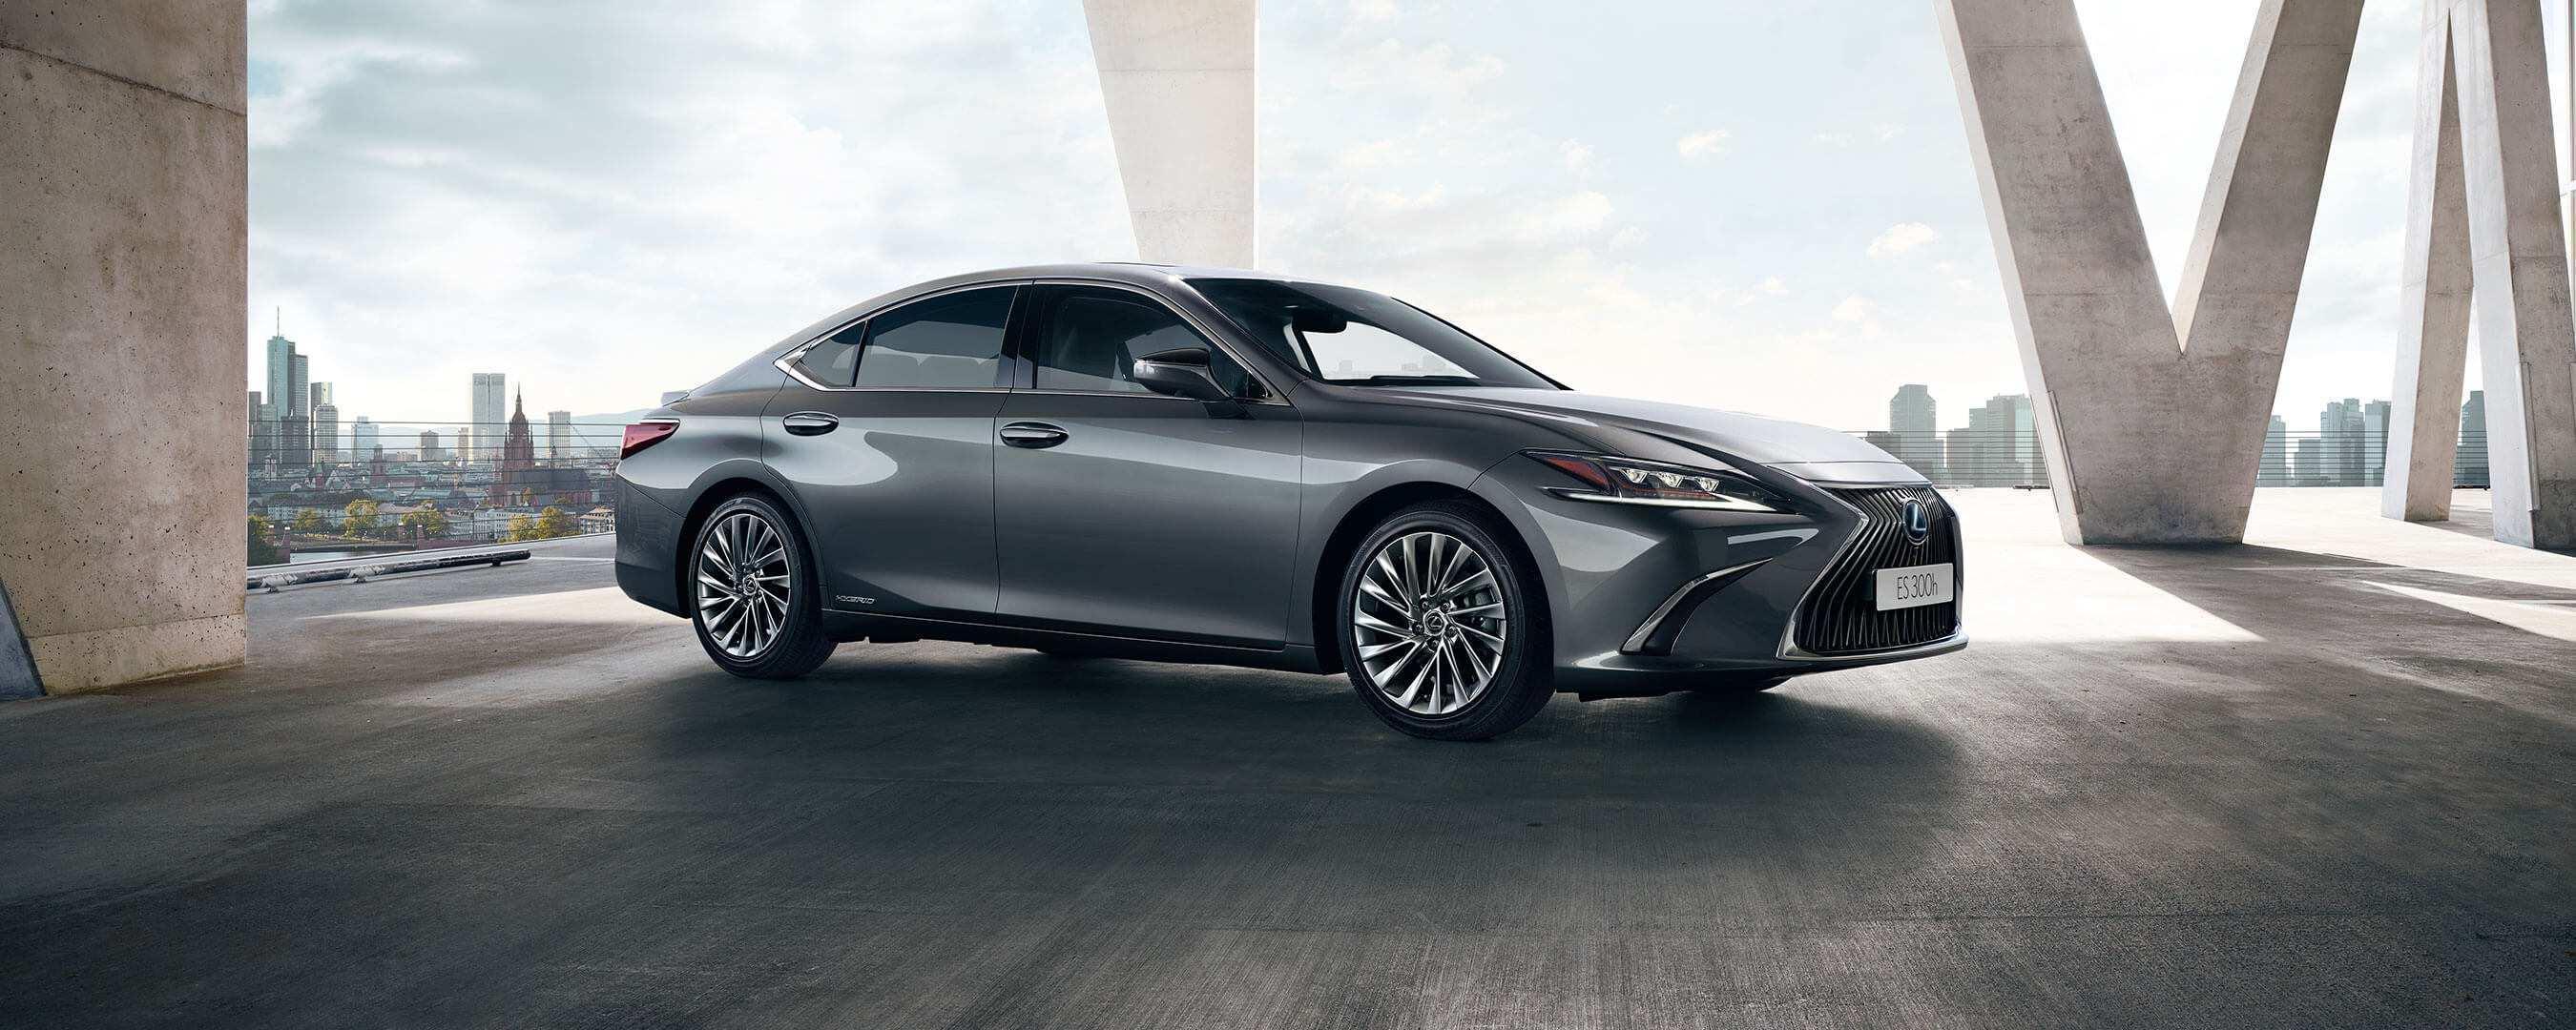 47 New Lexus Es 2019 Brochure Exterior Reviews for Lexus Es 2019 Brochure Exterior